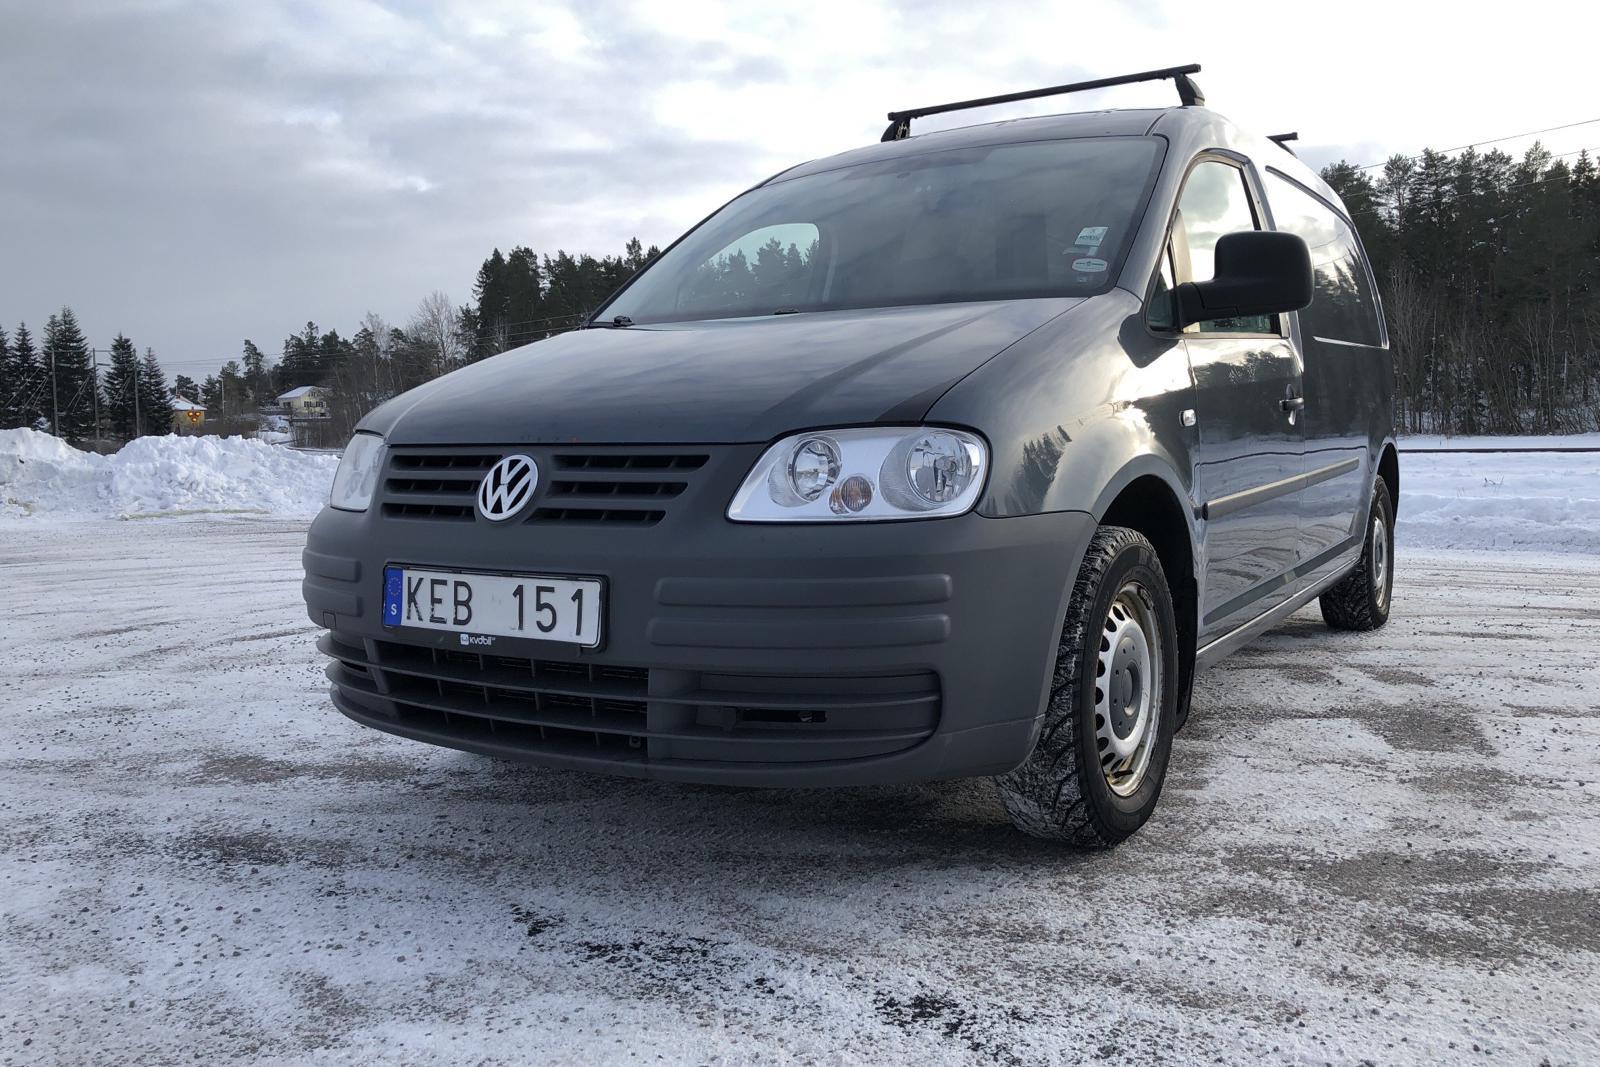 VW Caddy 1.9 TDI Maxi Skåp (105hk) - 178 430 km - Manual - Dark Grey - 2010